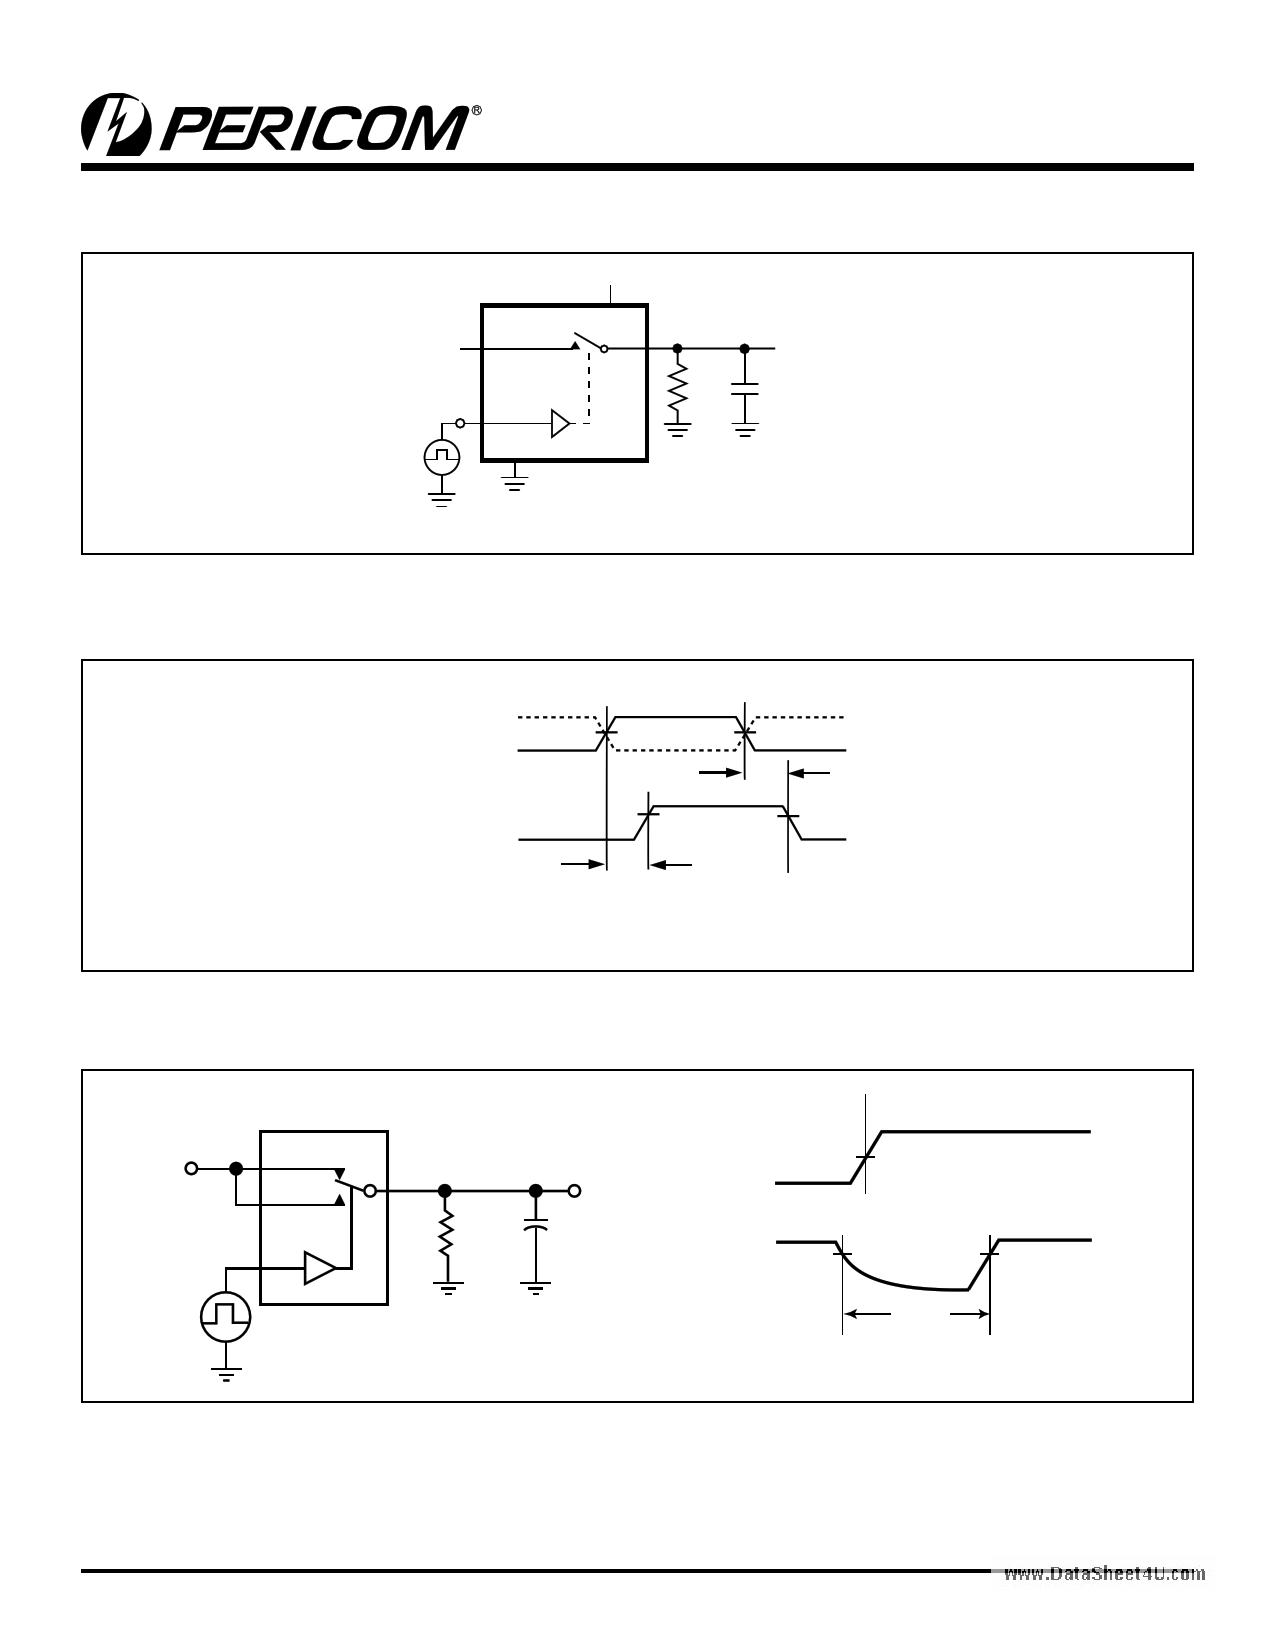 Enchanting Single Pole Double Throw Switch Diagram Photo - Best ...